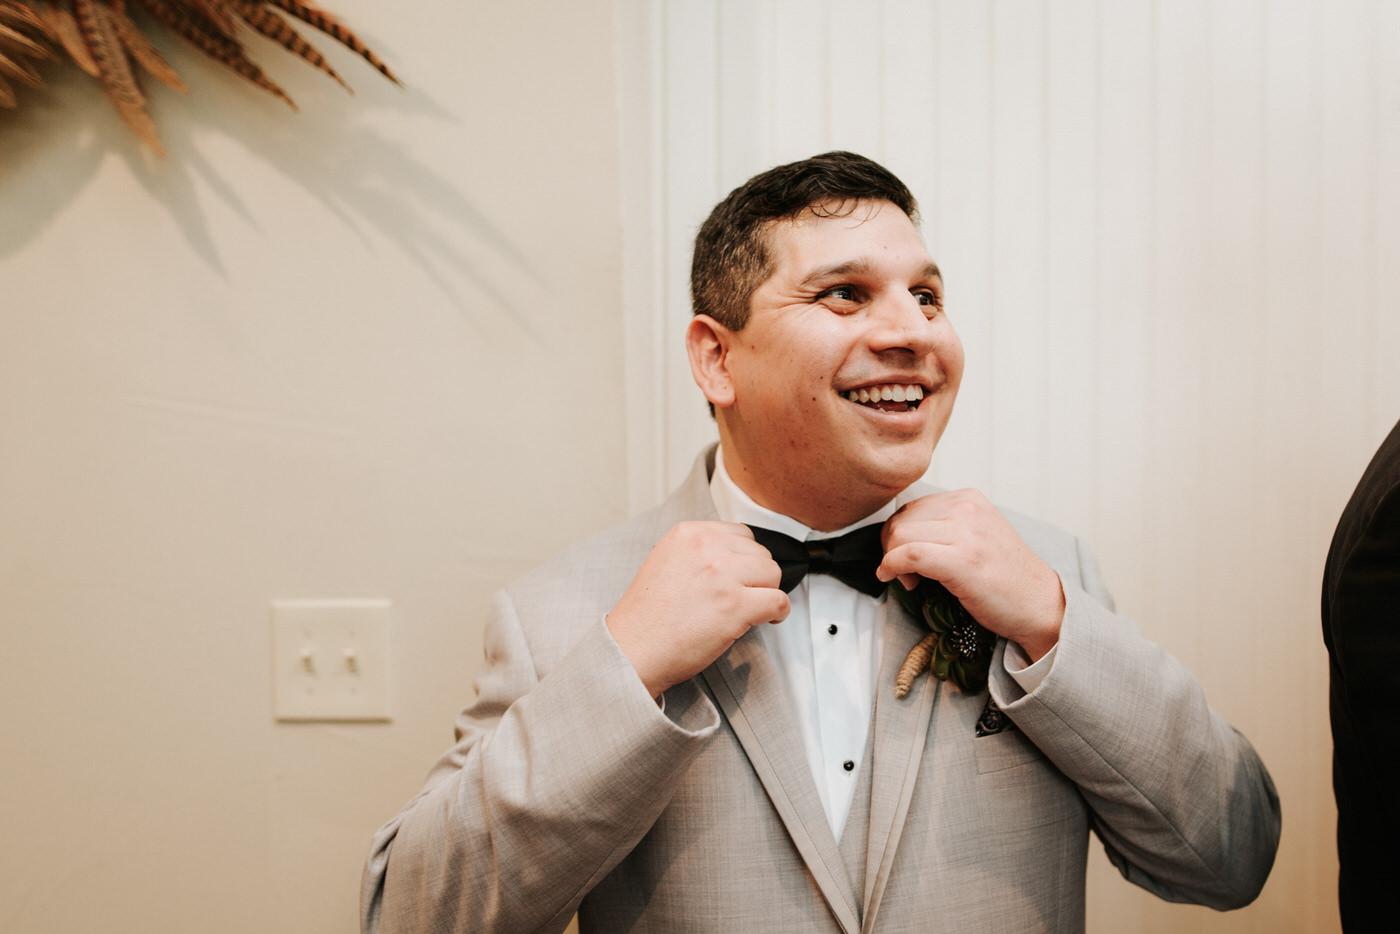 Excited groom at Pecan Springs Ranch Wedding